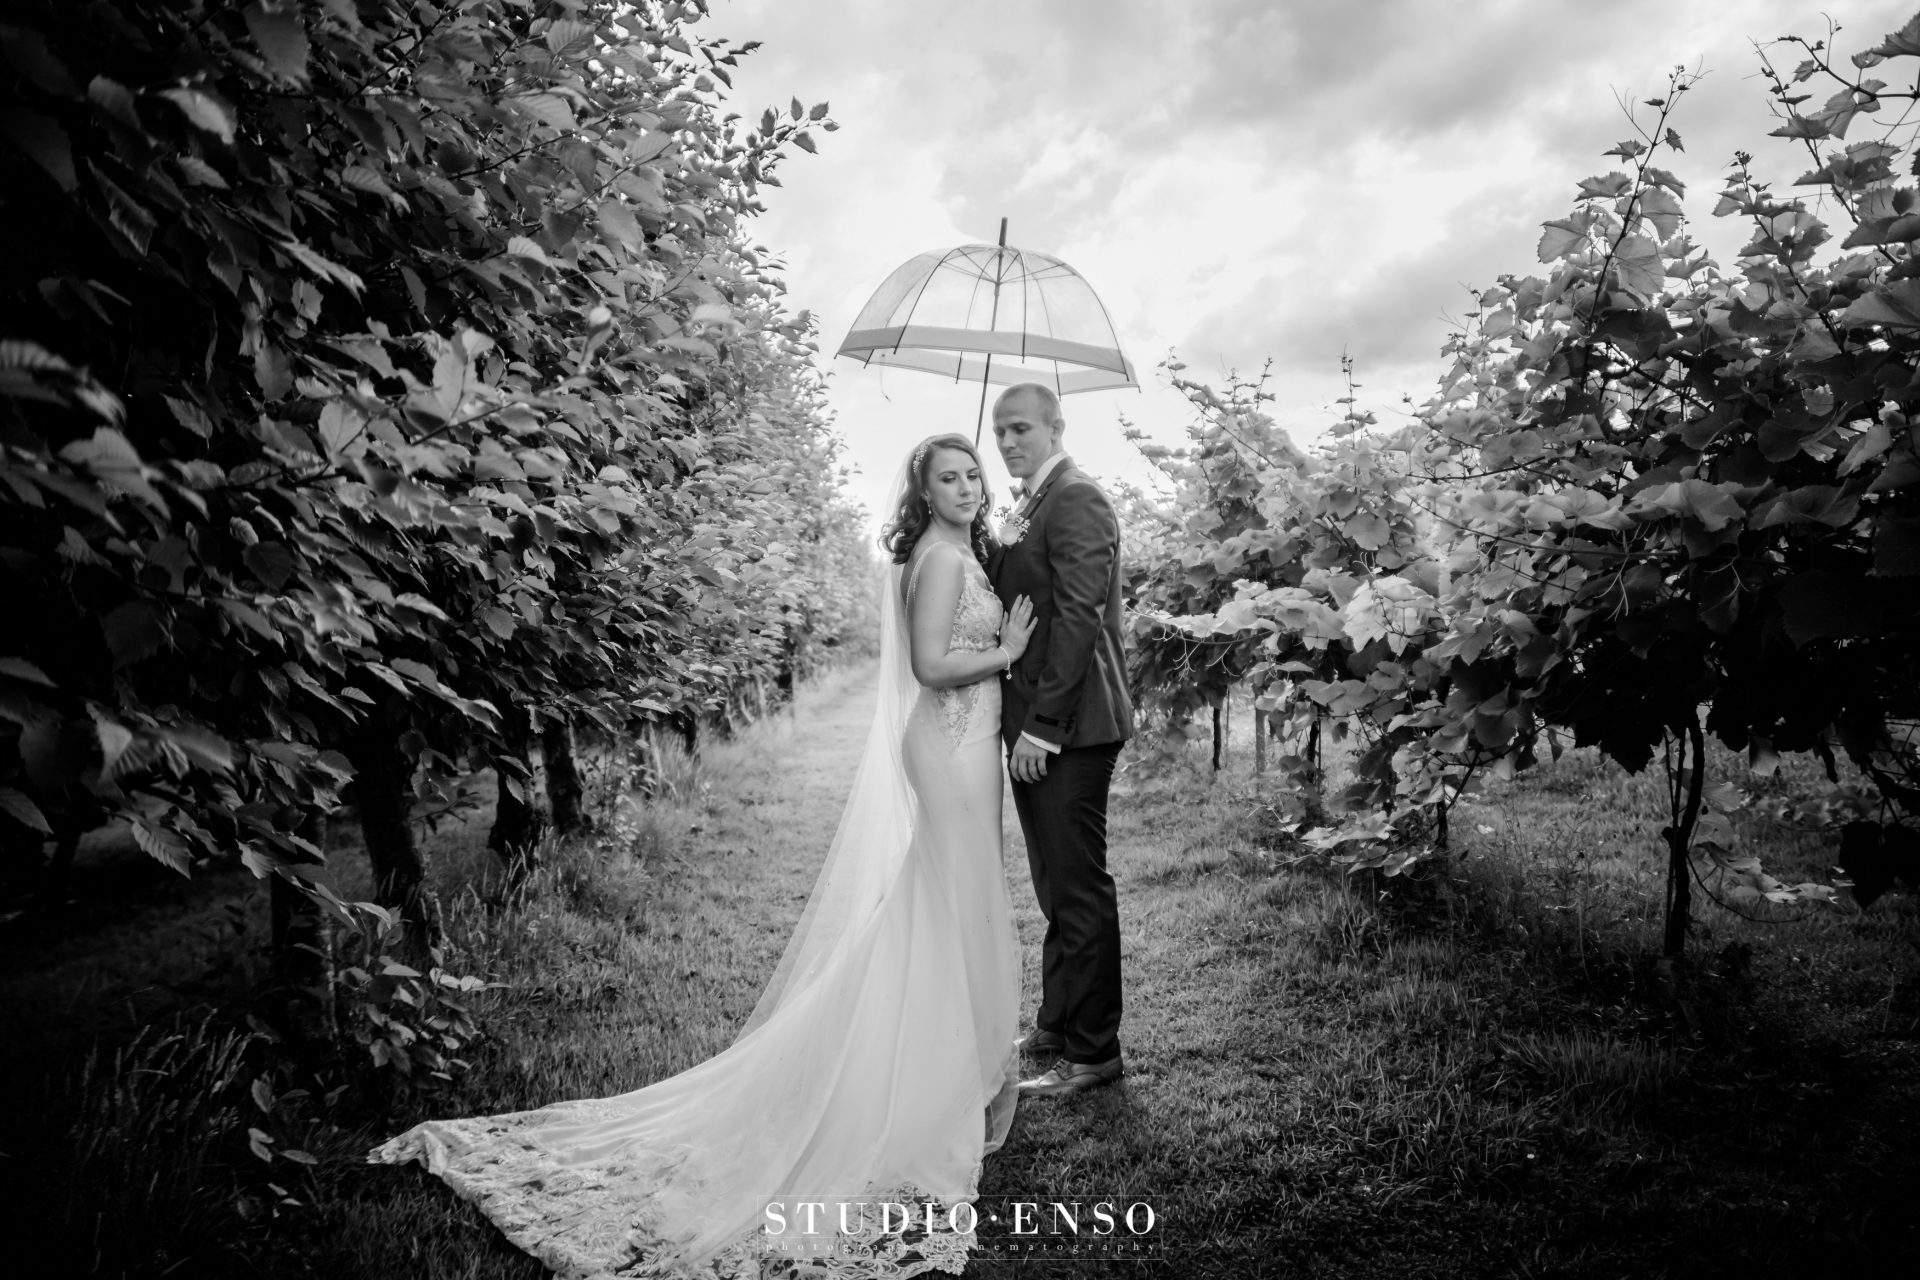 Bride and Groom under an umbrella on their wedding day at Llanerch Vineyard